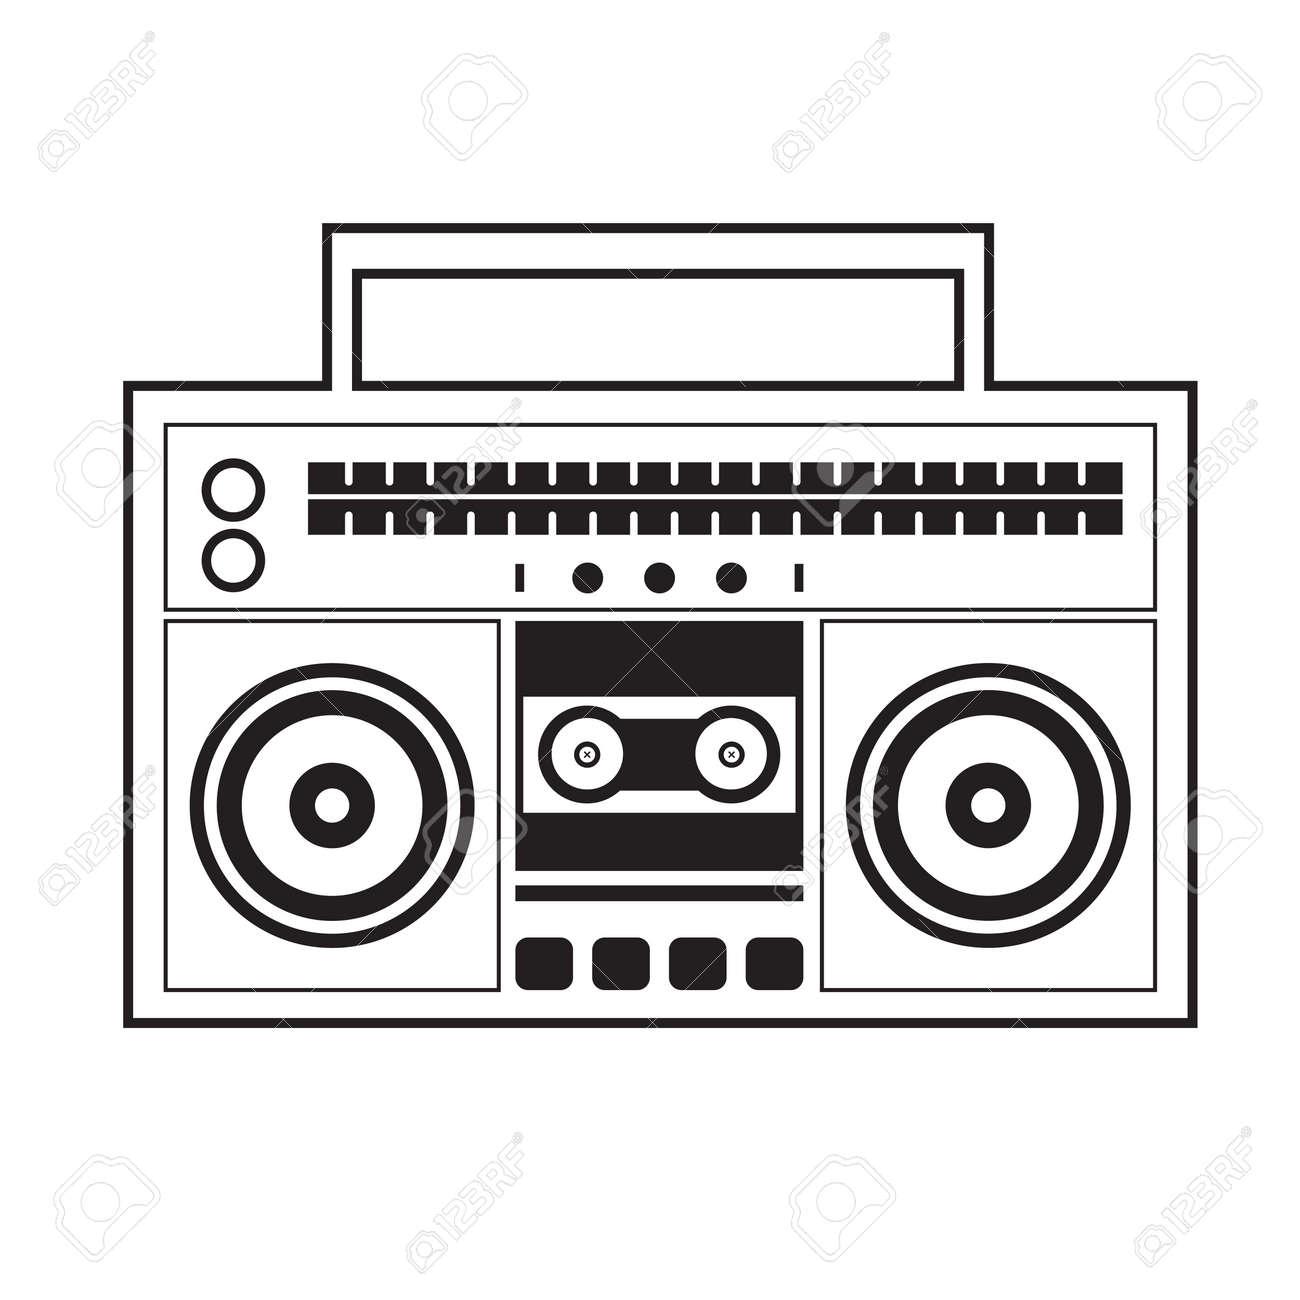 Ghetto blaster radio vector illustration royalty free cliparts ghetto blaster radio vector illustration stock vector 26453256 sciox Images